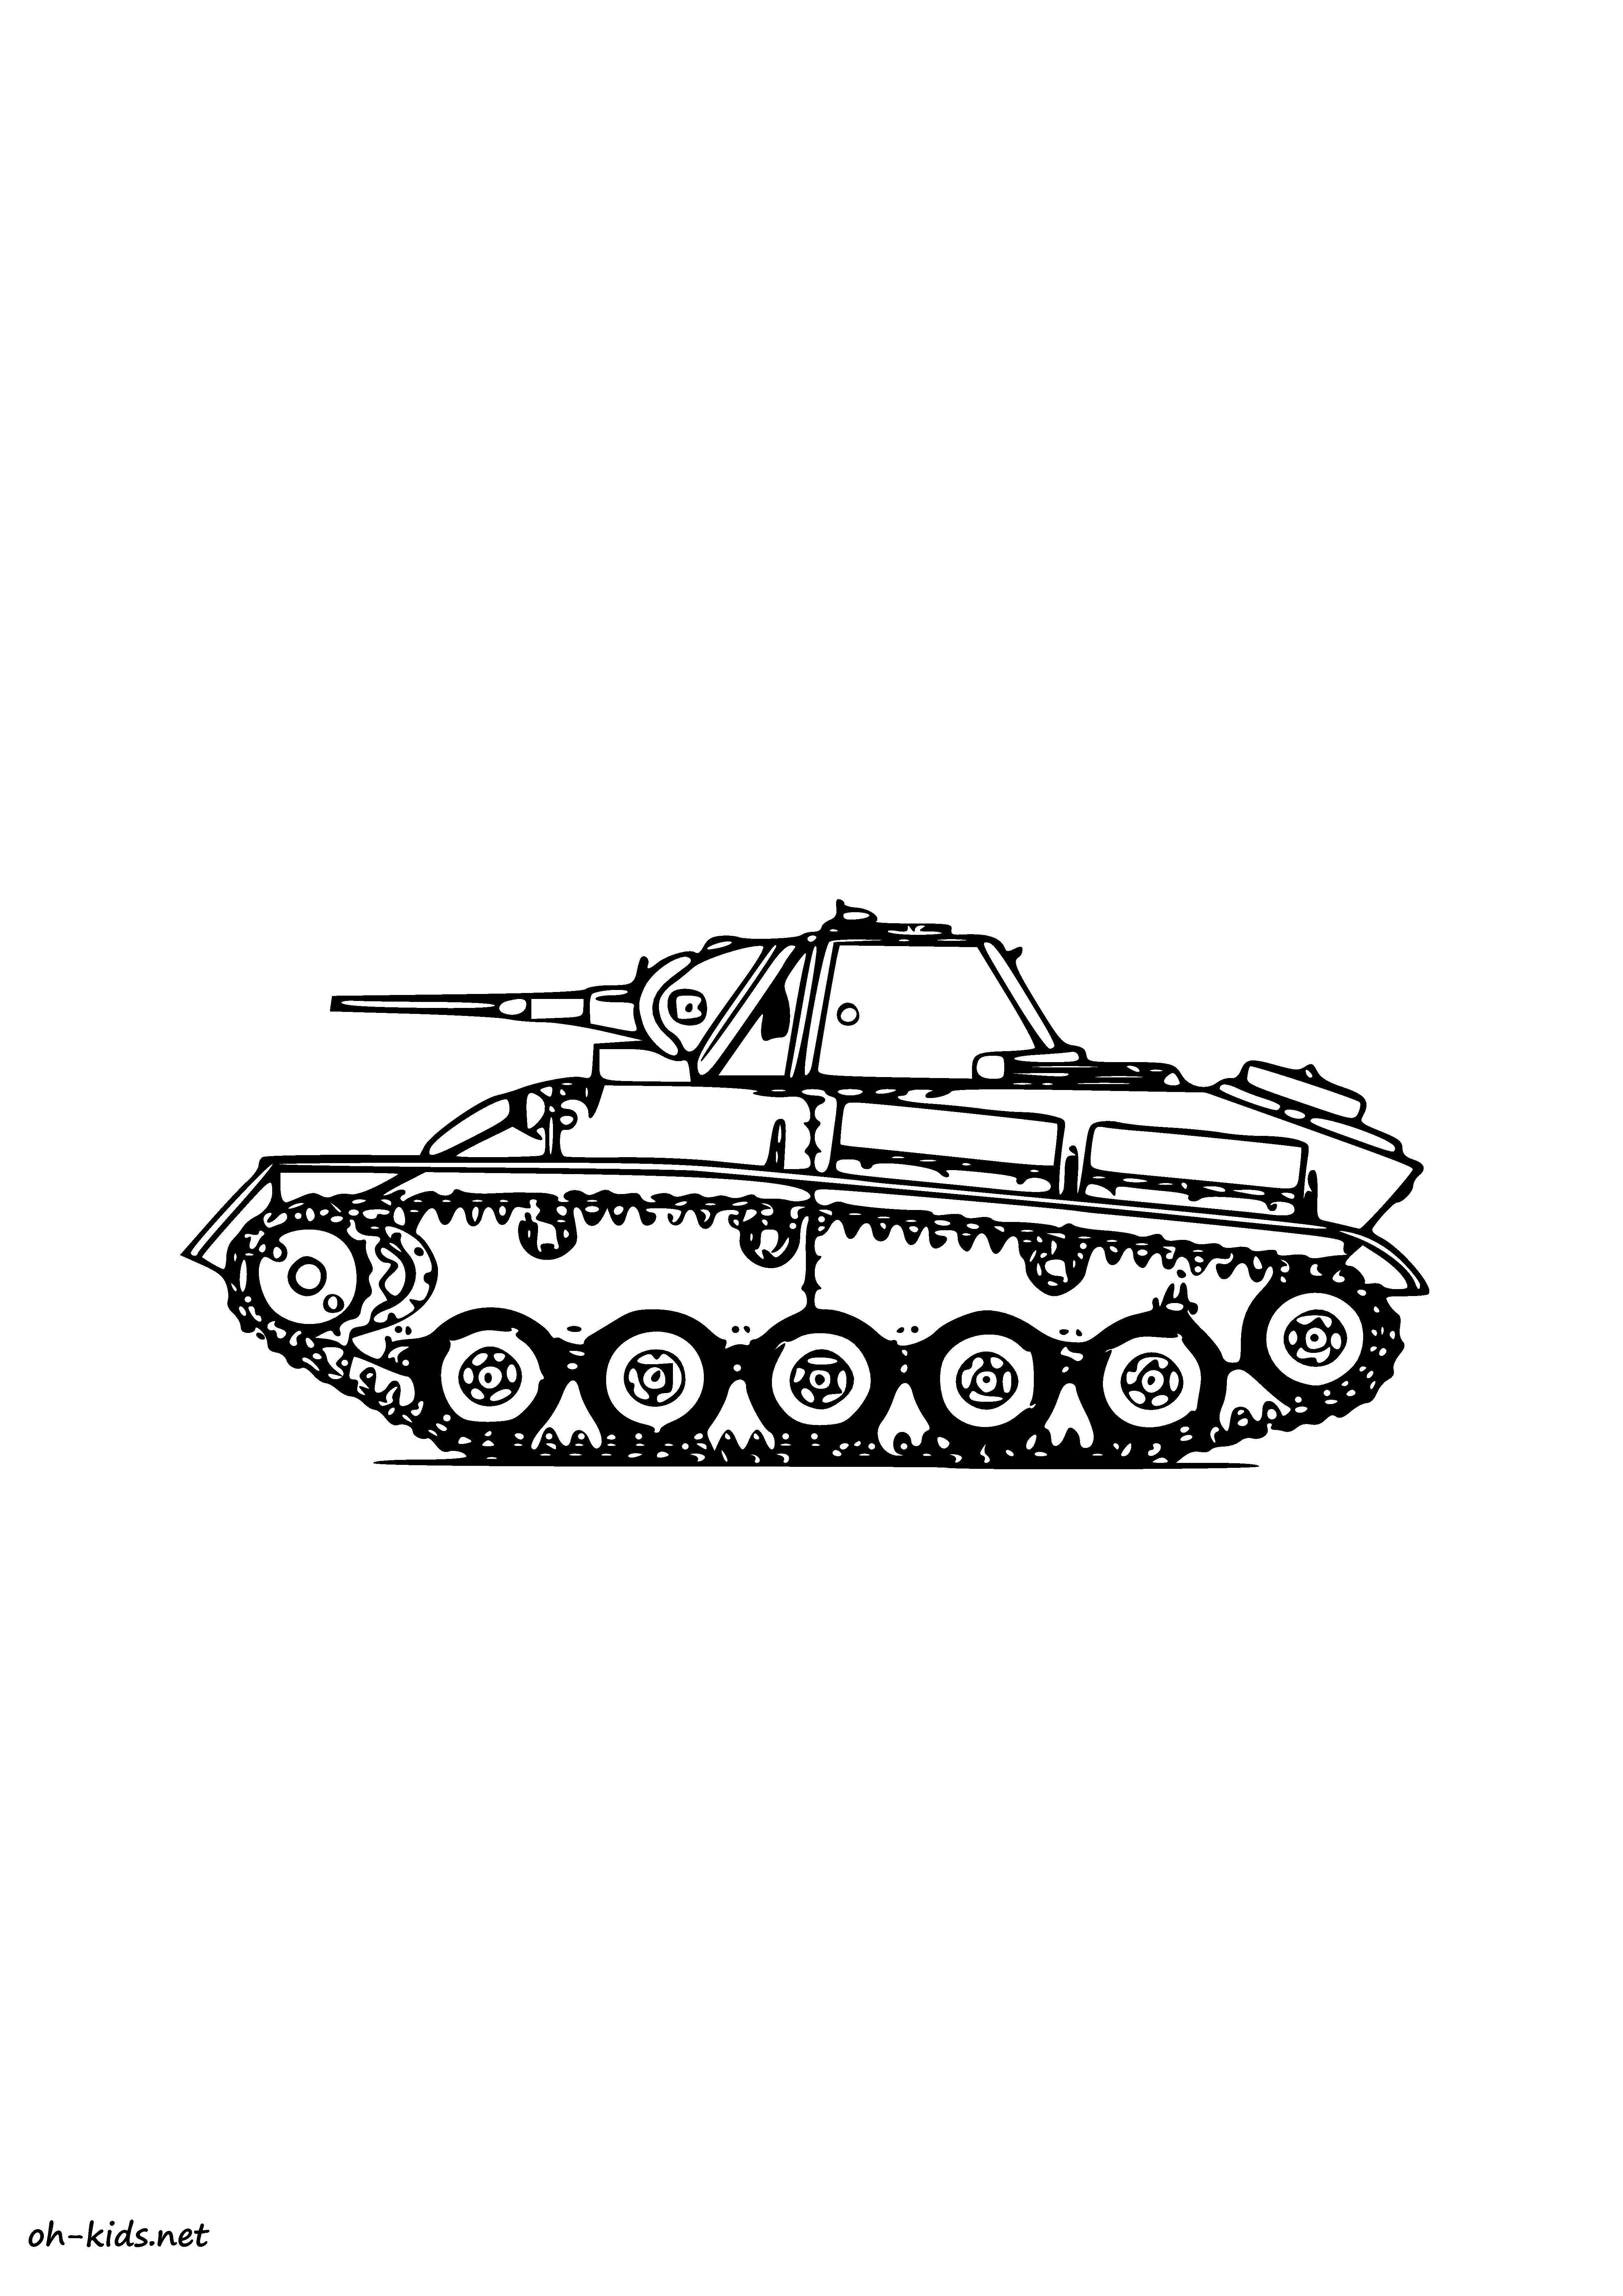 Dessin 306 coloriage tank imprimer oh - Coloriage de tank ...